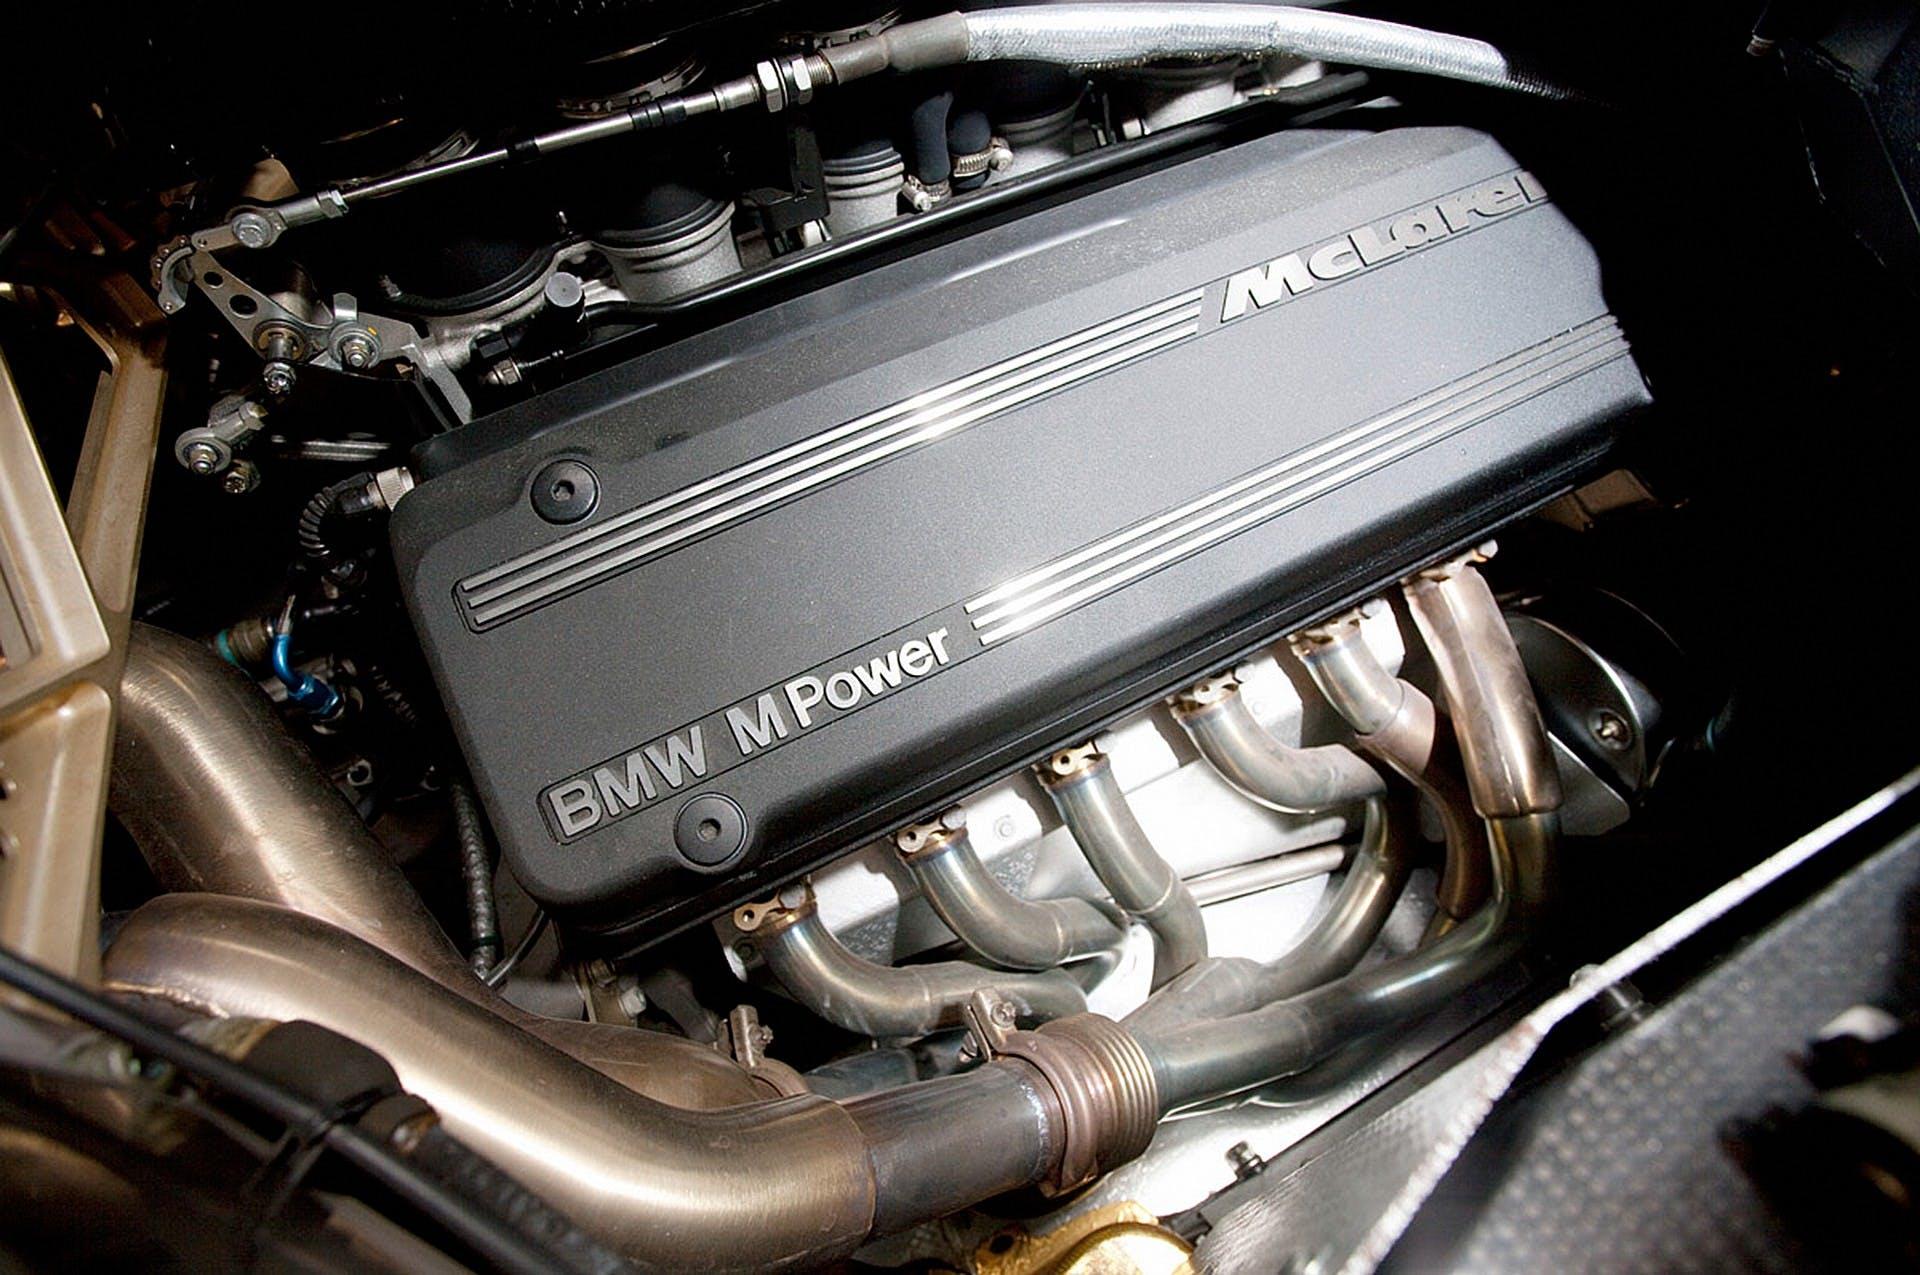 McLaren F1 motore